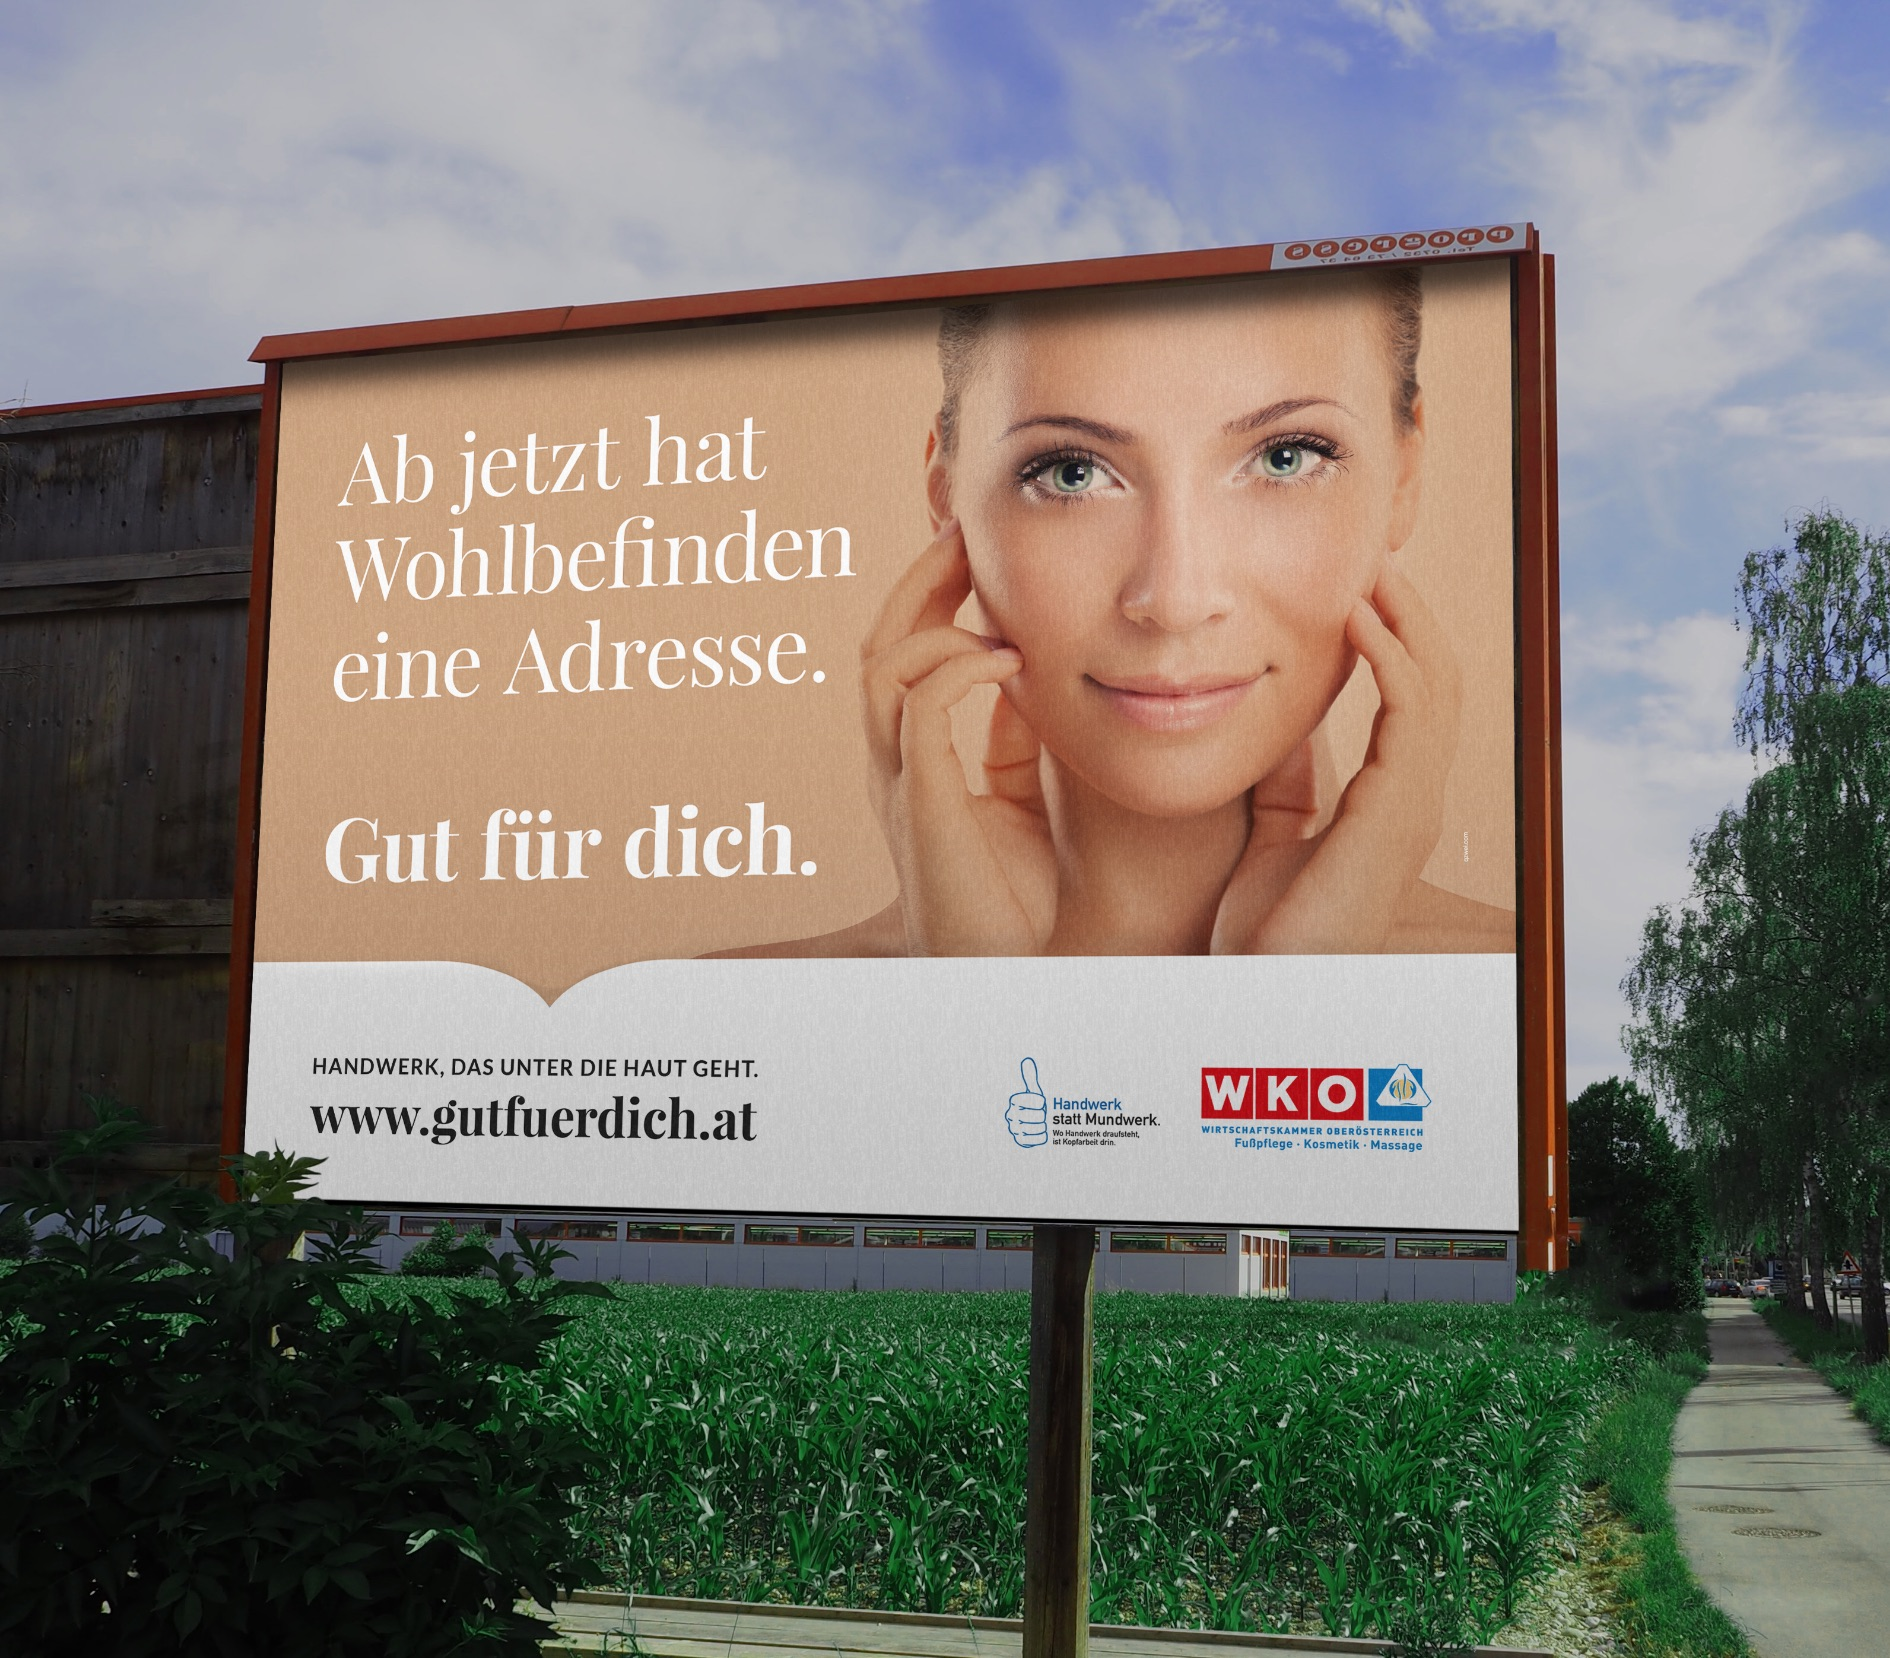 Q2 Werbeagentur, WKO, Plakat